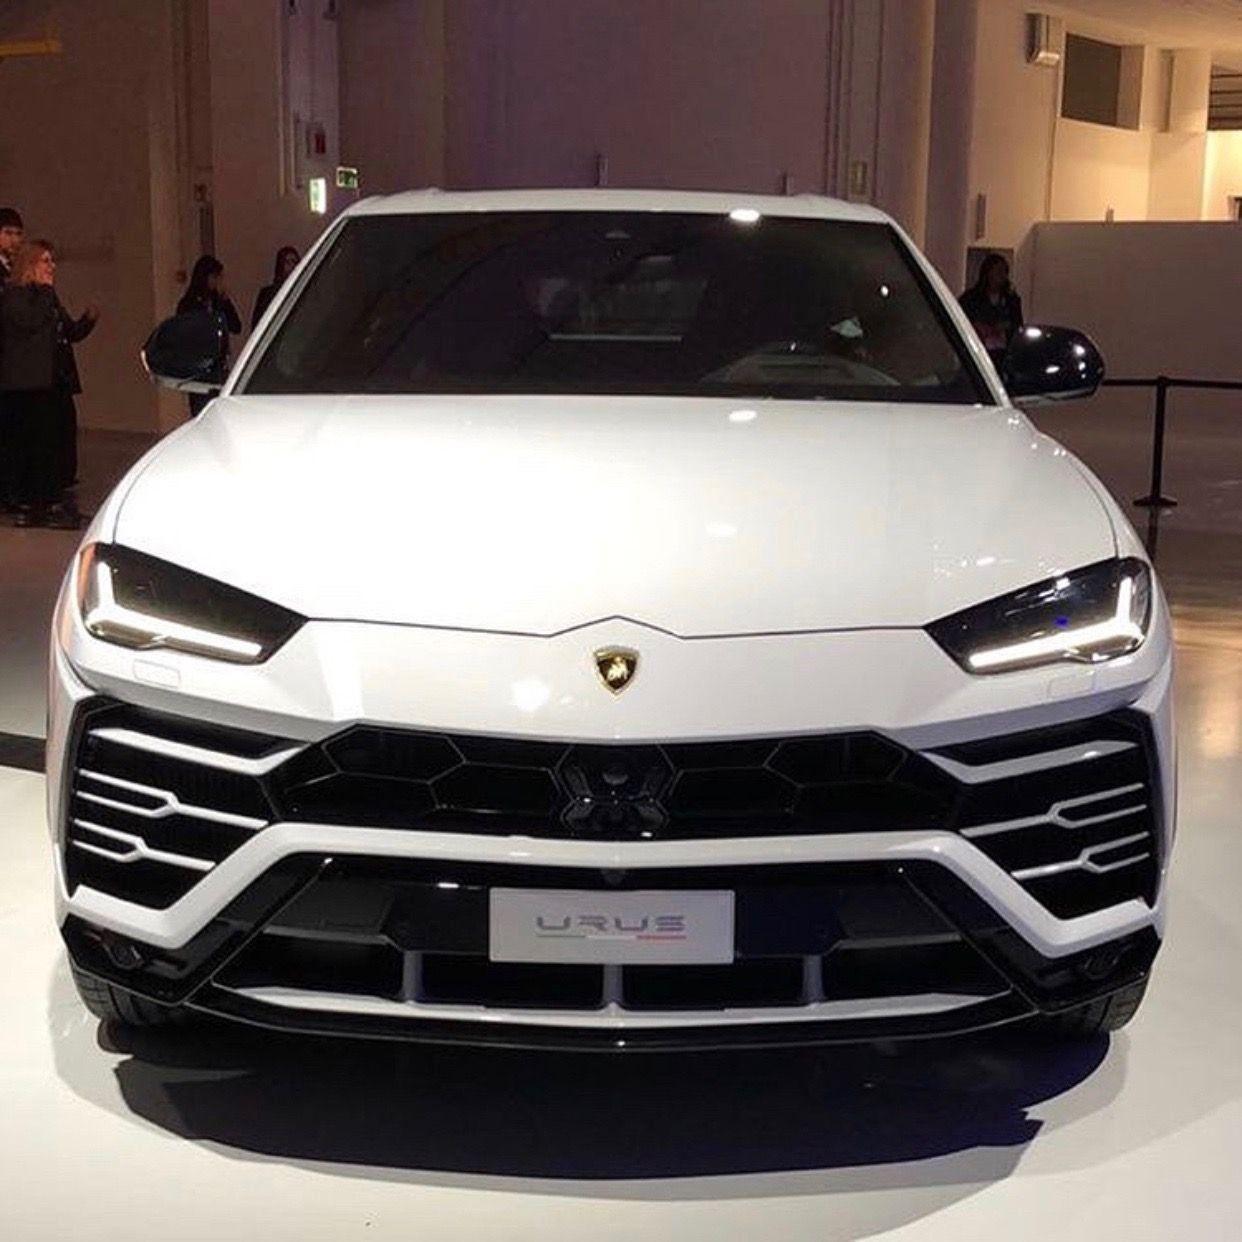 Lamborghini Urus Painted In Bianco Monocerus Photo Taken